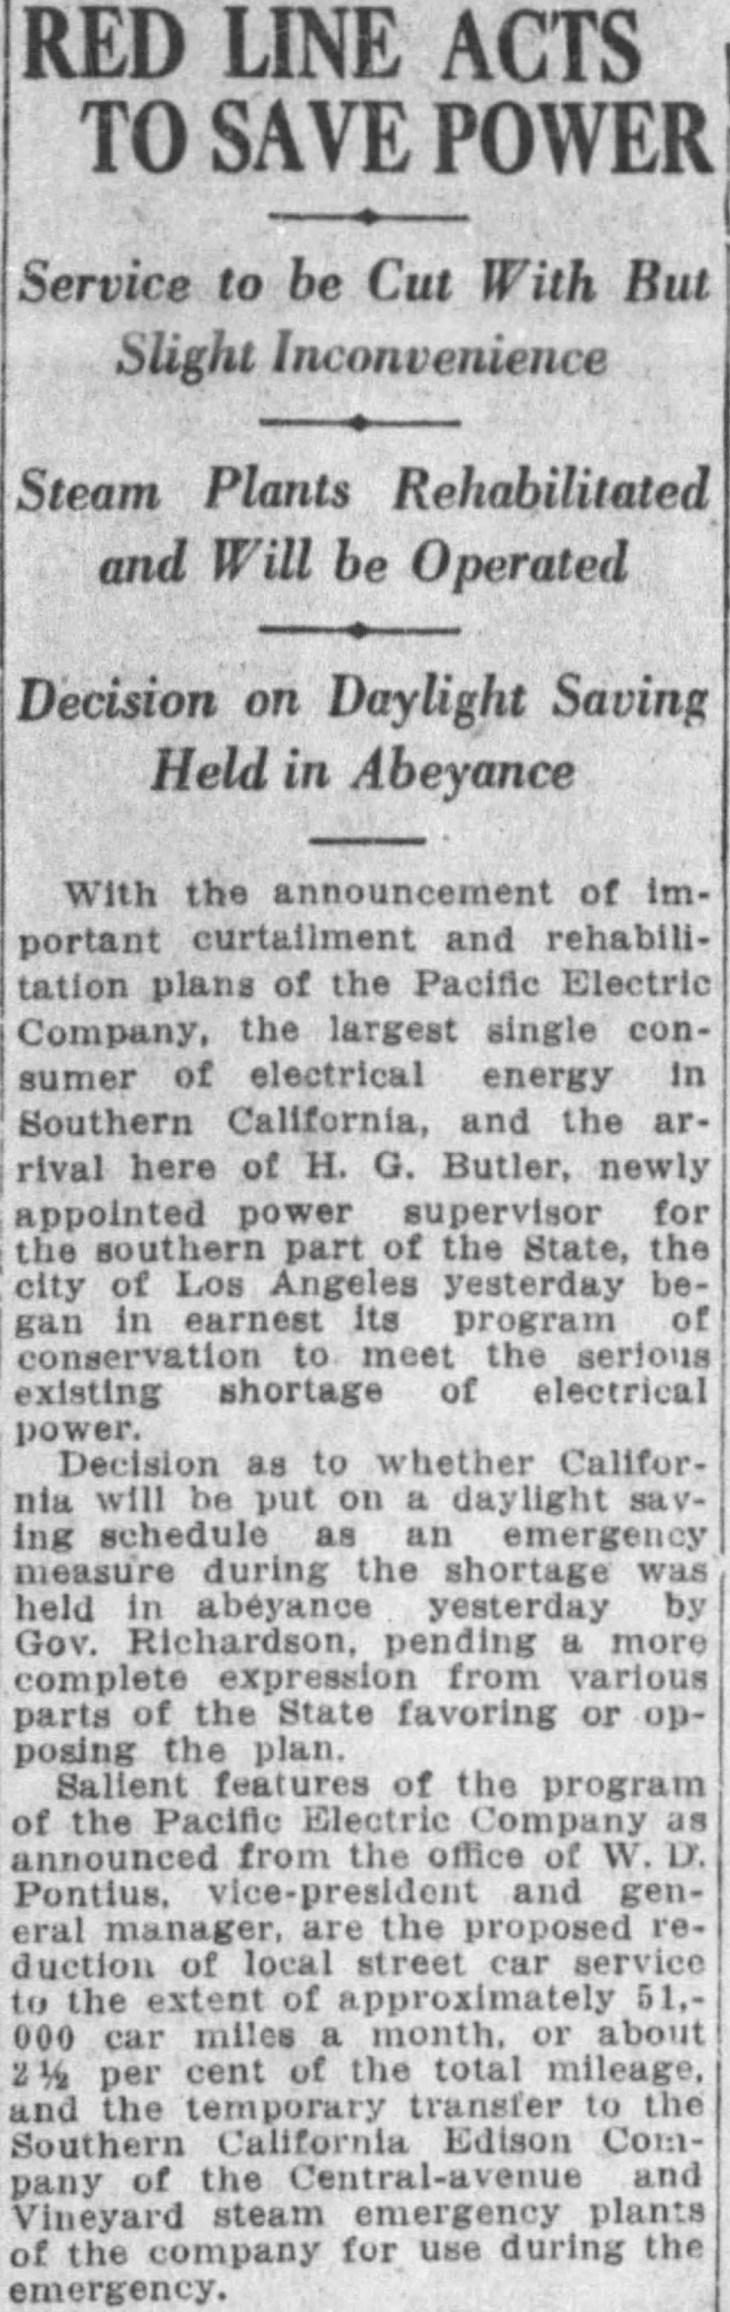 The_Los_Angeles_Times_Tue__Jul_1__1924_.jpg detail